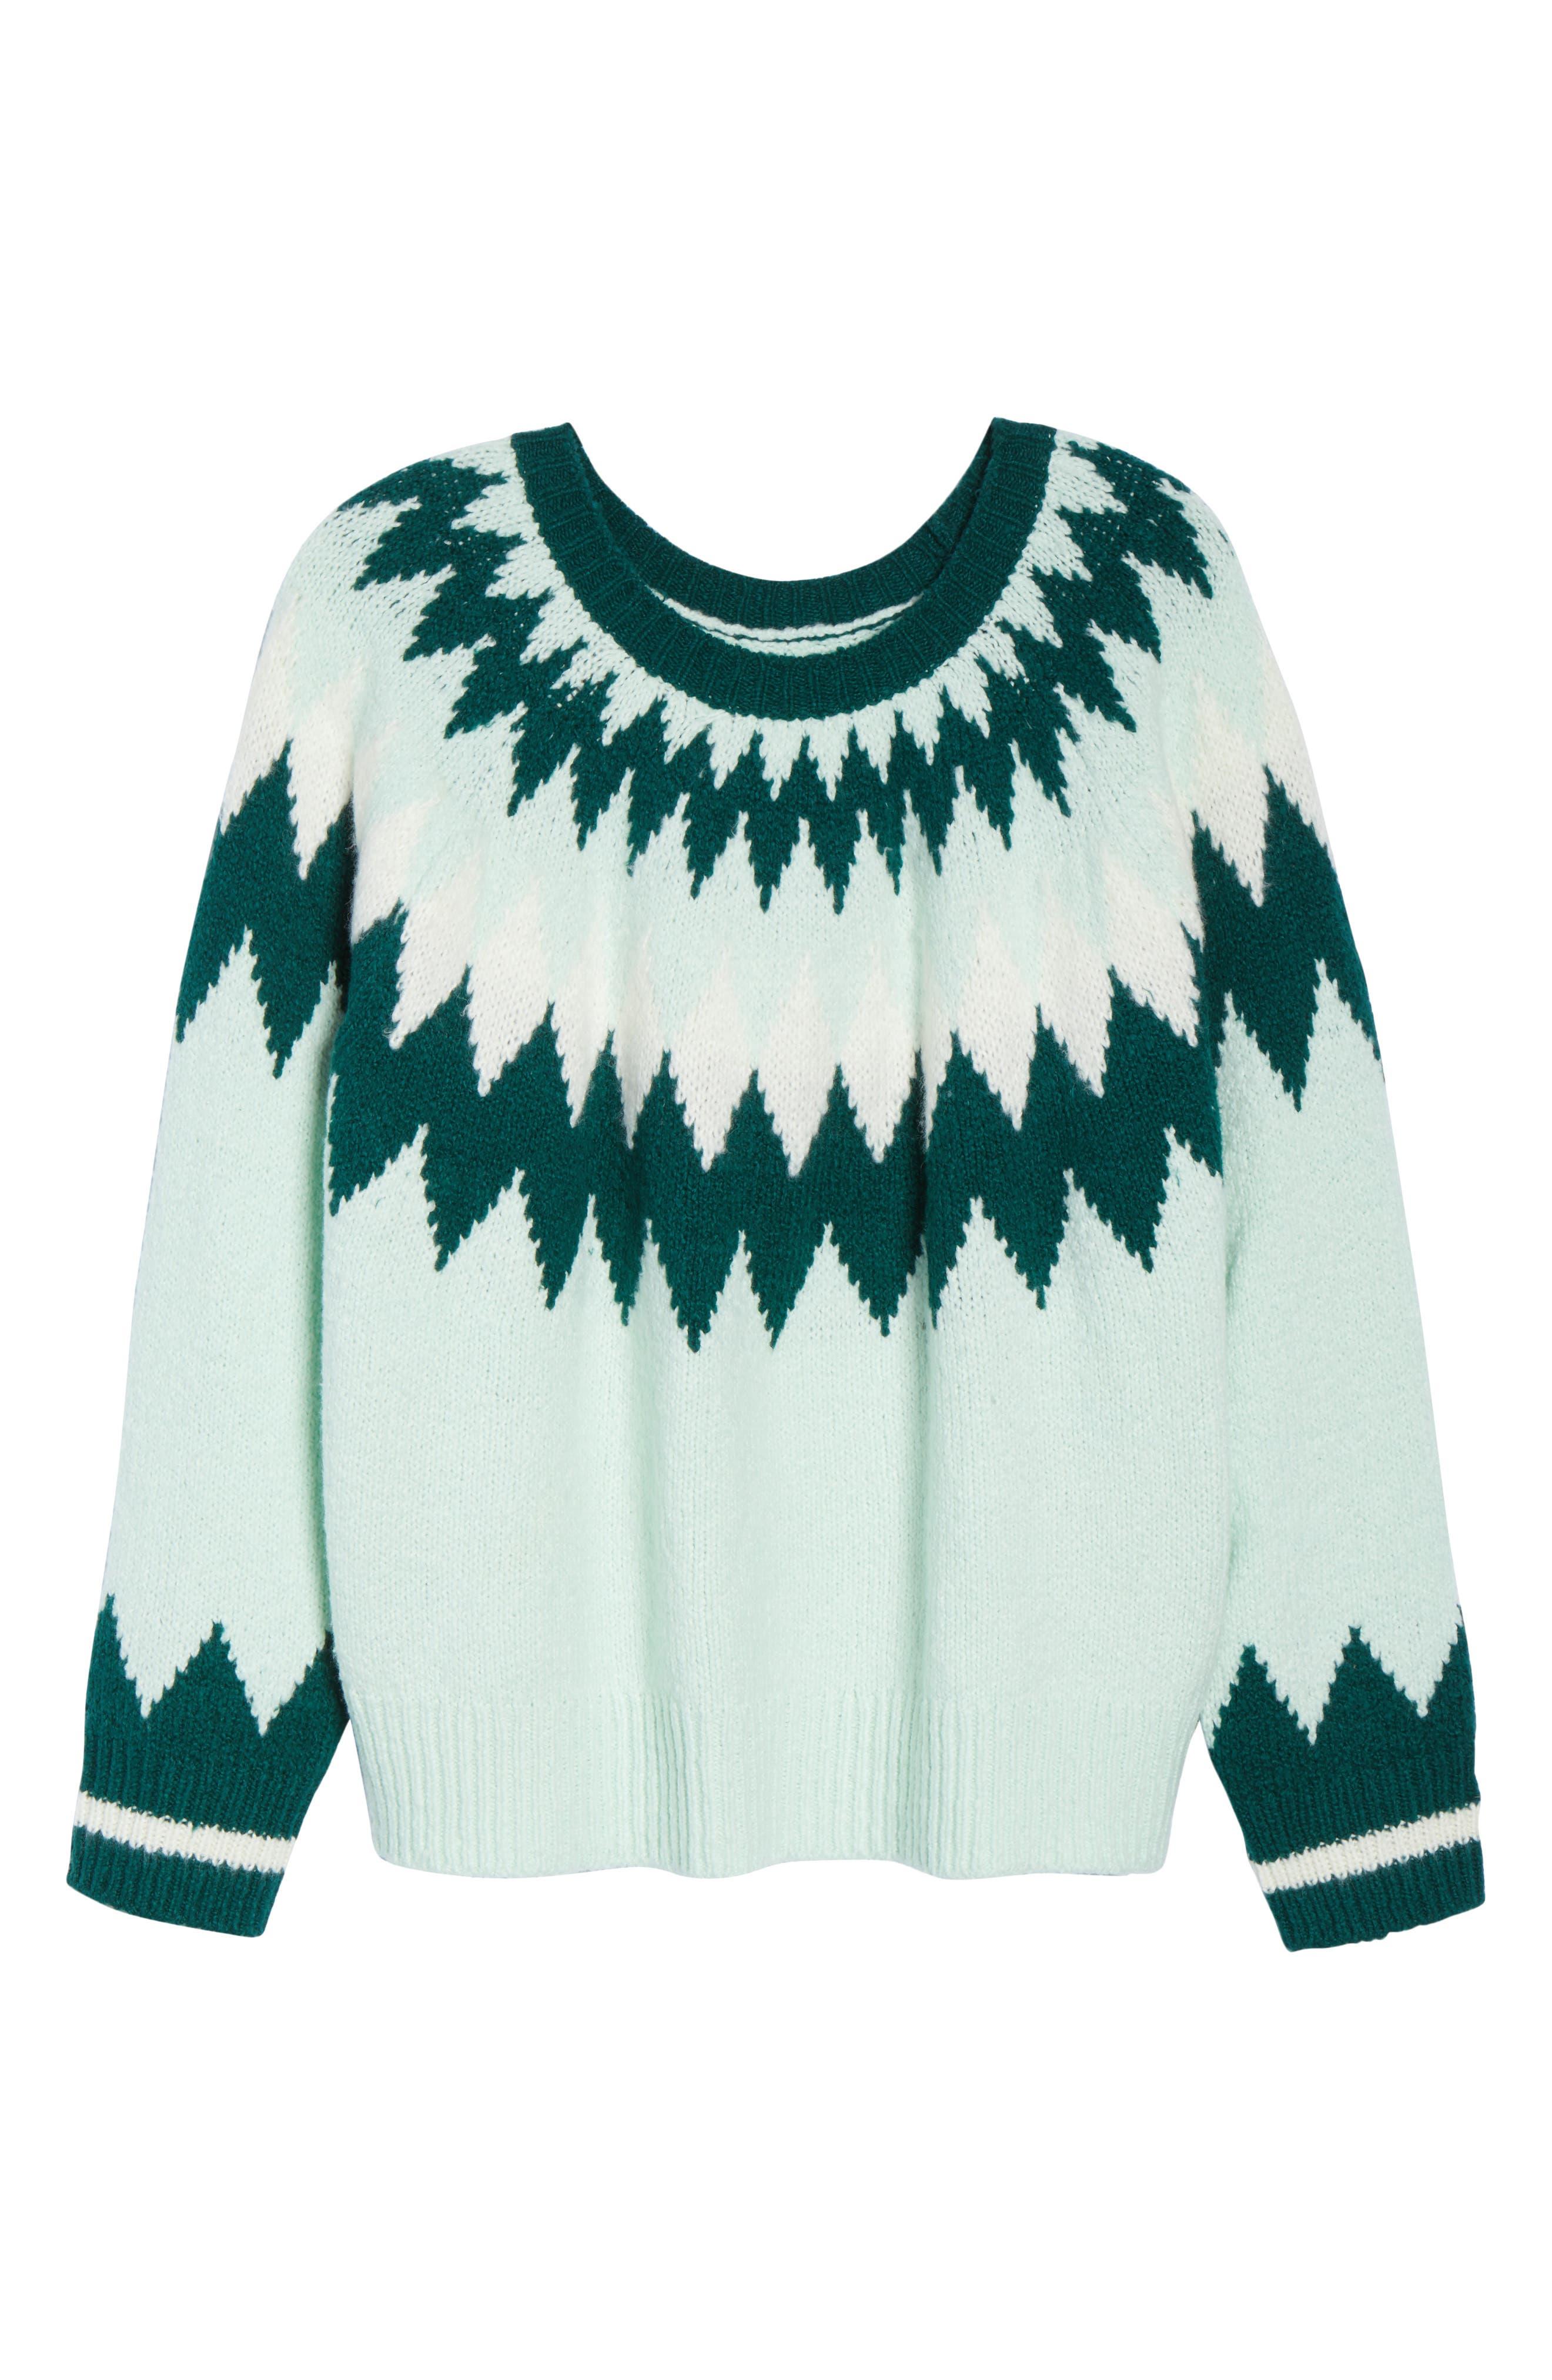 Cozy Ski Sweater,                             Alternate thumbnail 6, color,                             GREEN PLACID FAIRISLE